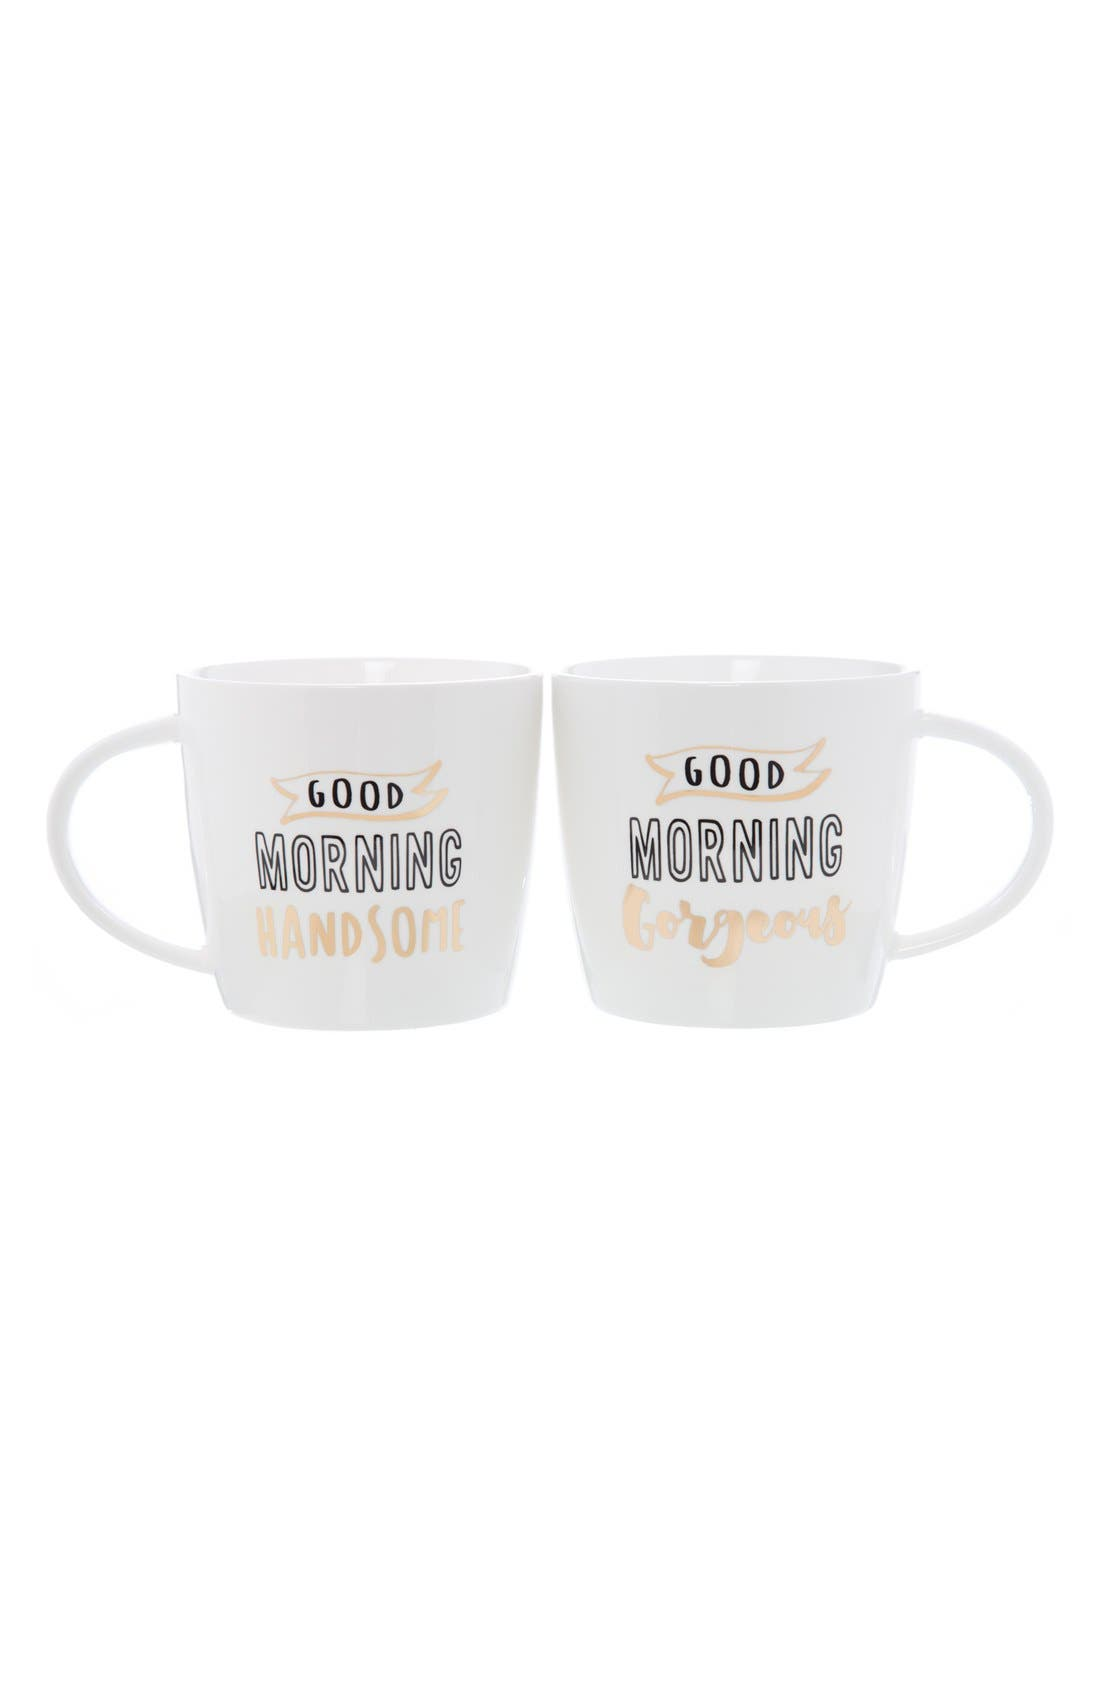 Main Image - Slant Collections 'Good Morning' Ceramic Coffee Mugs (Set of 2)